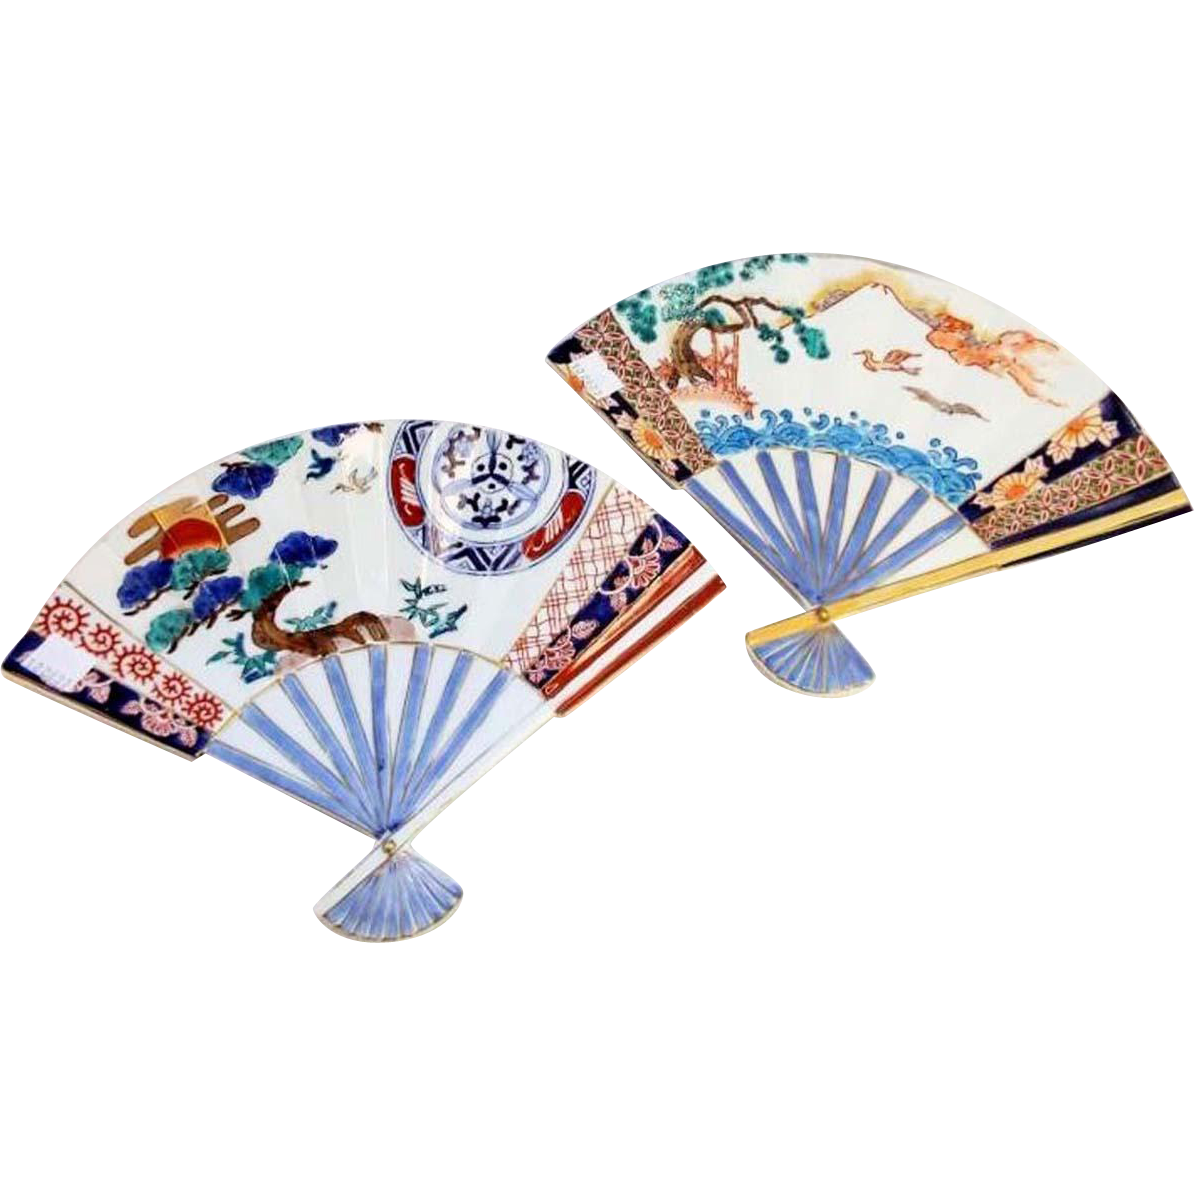 Japanese Vintage Pair of Imari Arita Porcelain Decorative Enameled Wall Fan